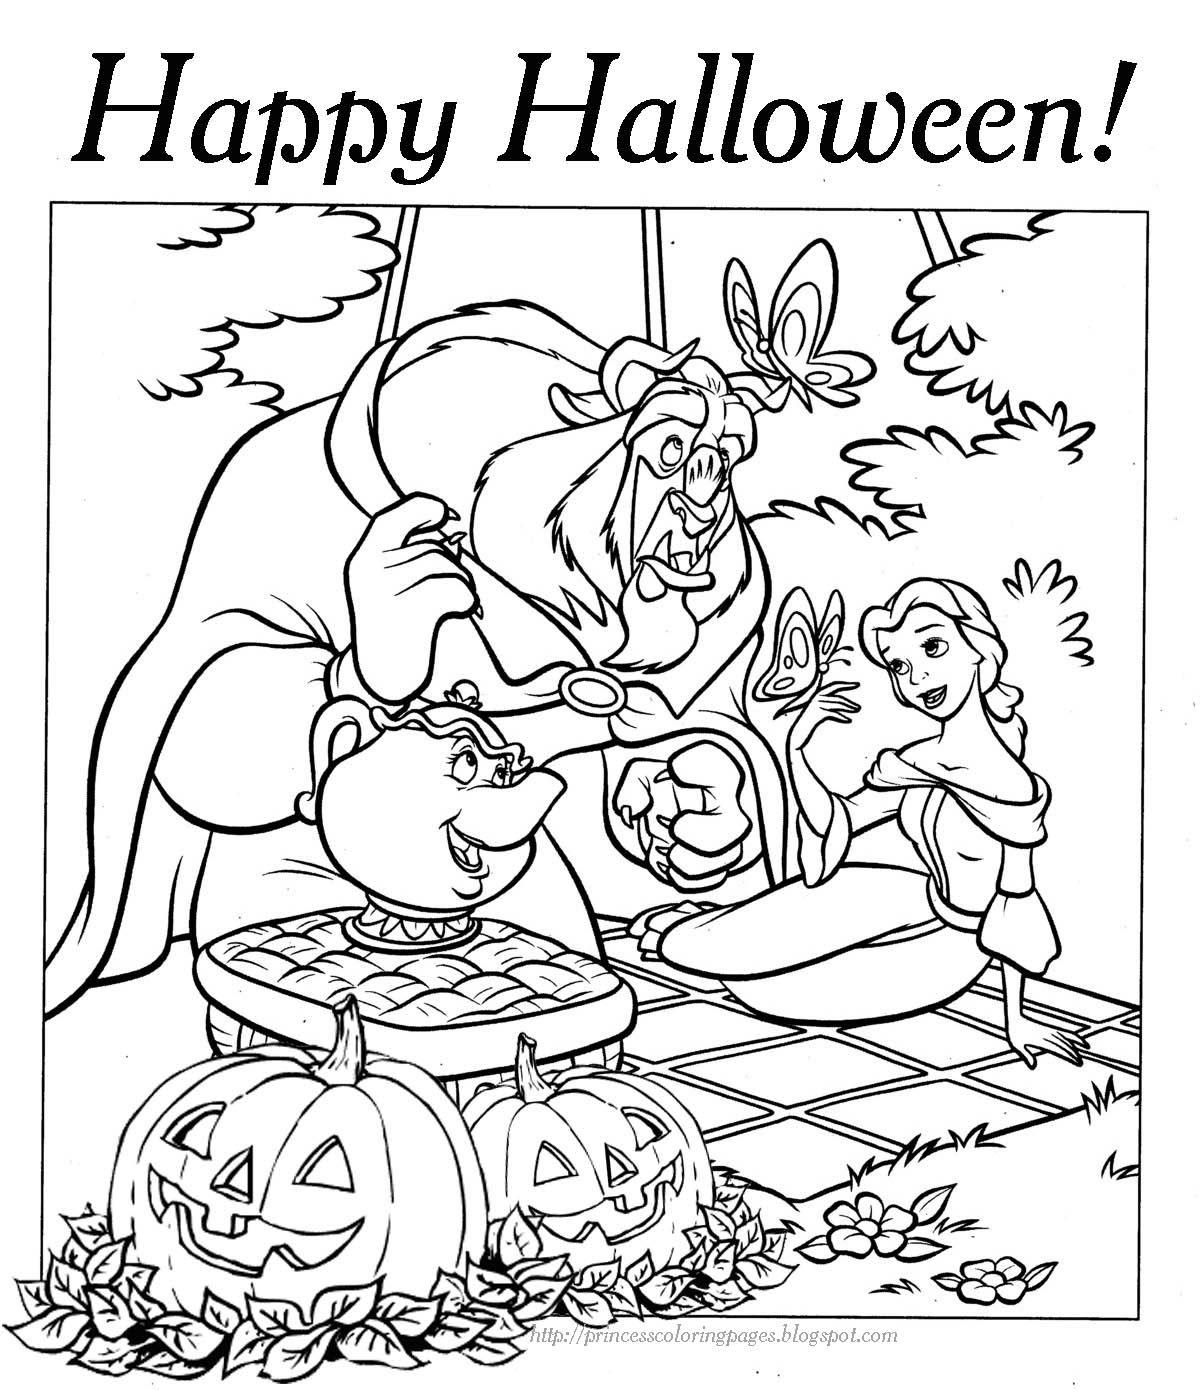 Halloween Coloring Pages HALLOWEEN COLORING PAGE